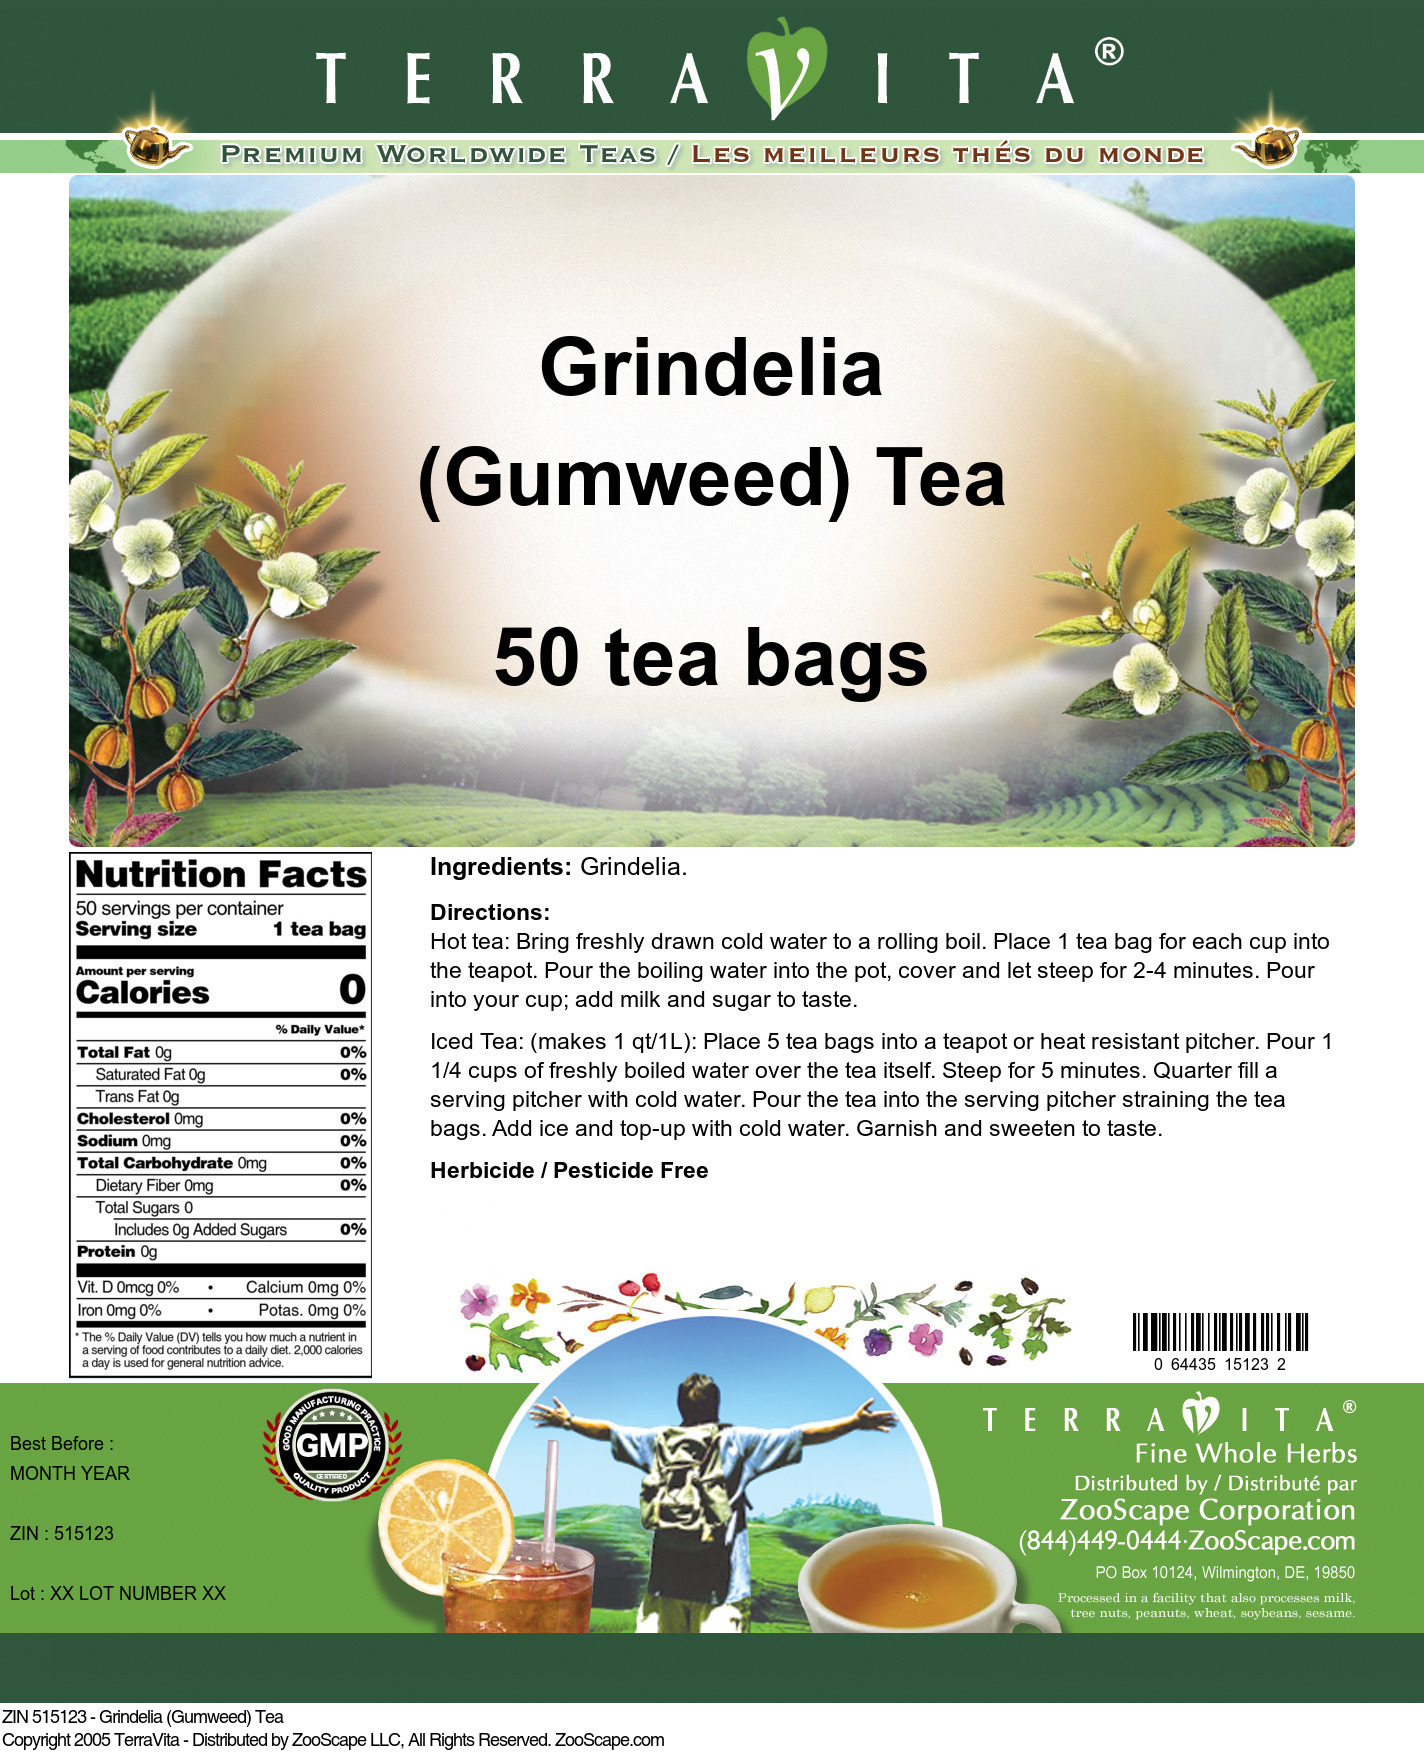 Grindelia (Gumweed) Tea